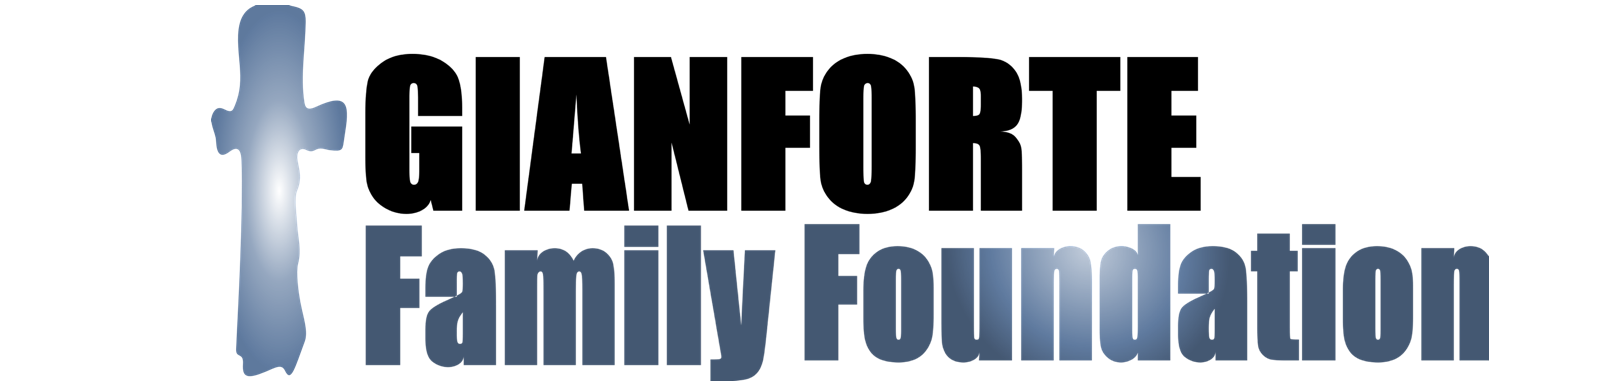 1 Gianforte Foundation.png